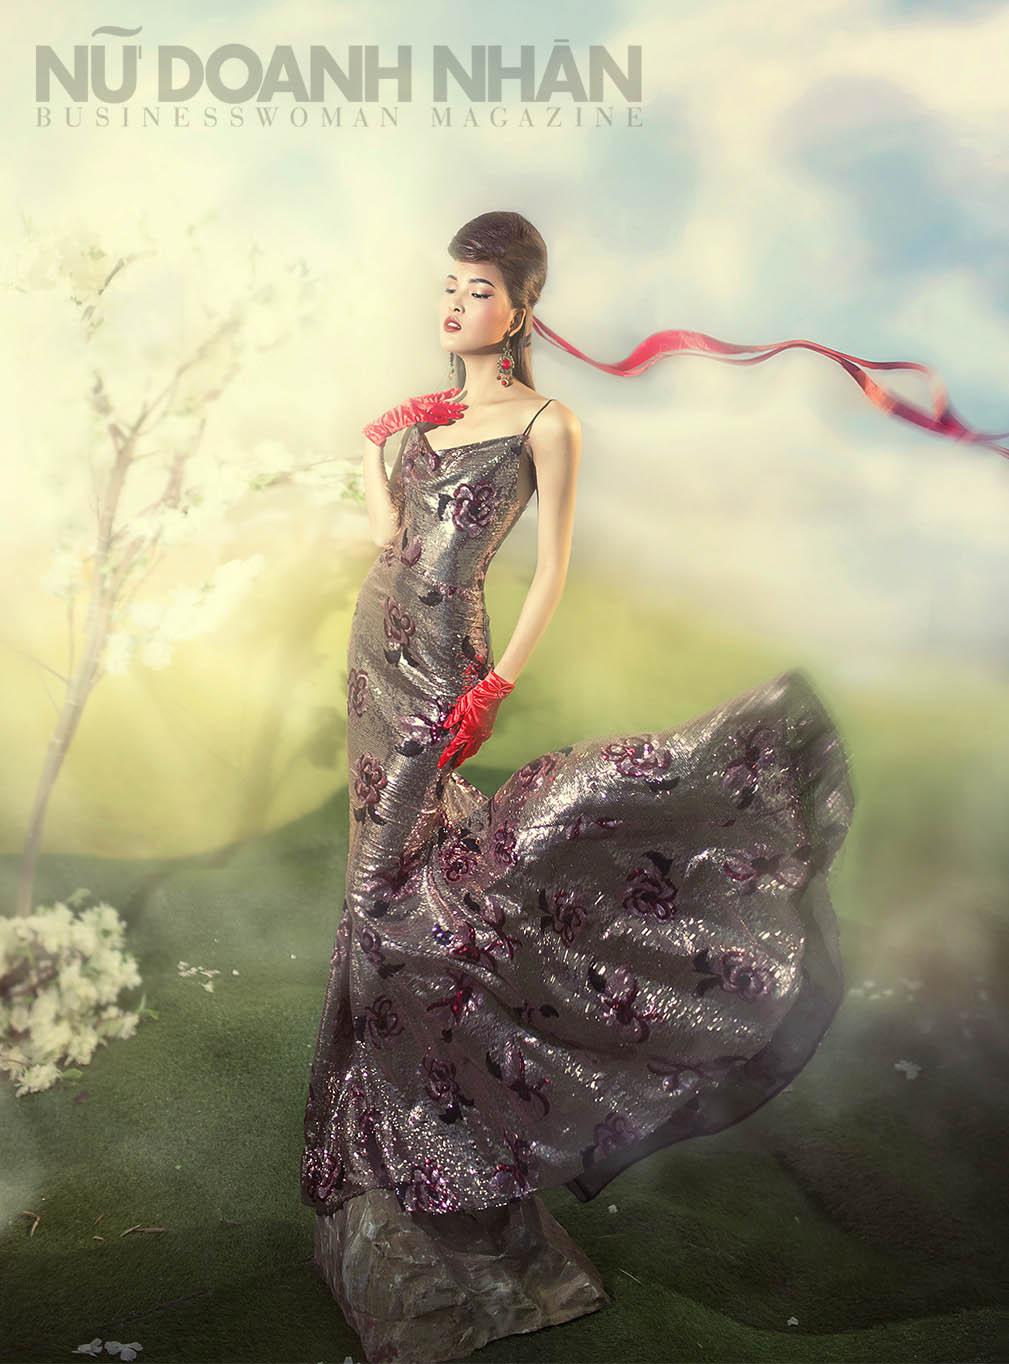 NDN_Wedsite_fashion nguoi mau_11